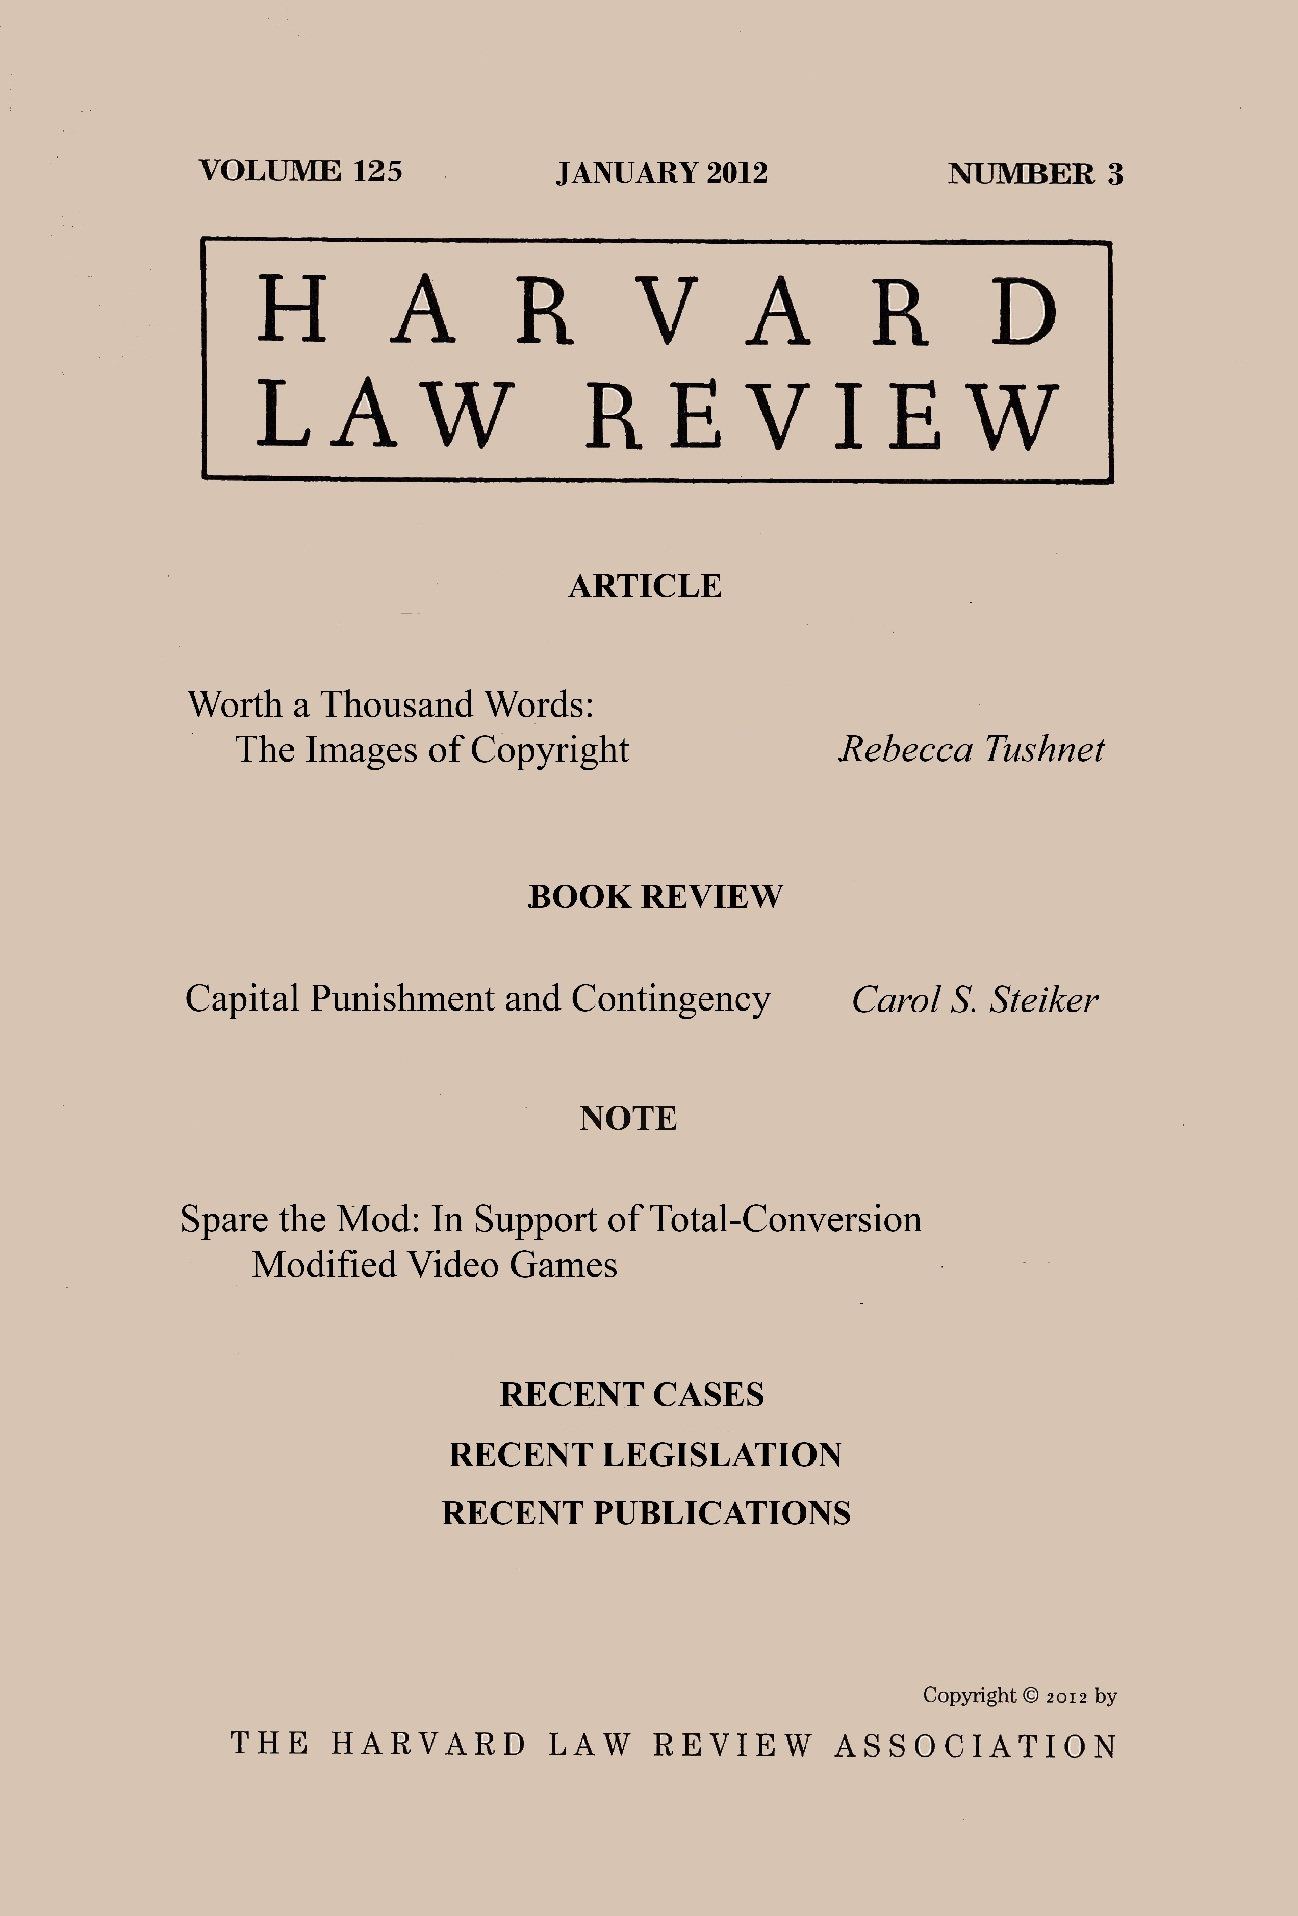 dissertation copyright law Phd proposal guidelines copyright law and the doctoral dissertation dna extraction how to write experiment report amorce de dissertation de philosophie.